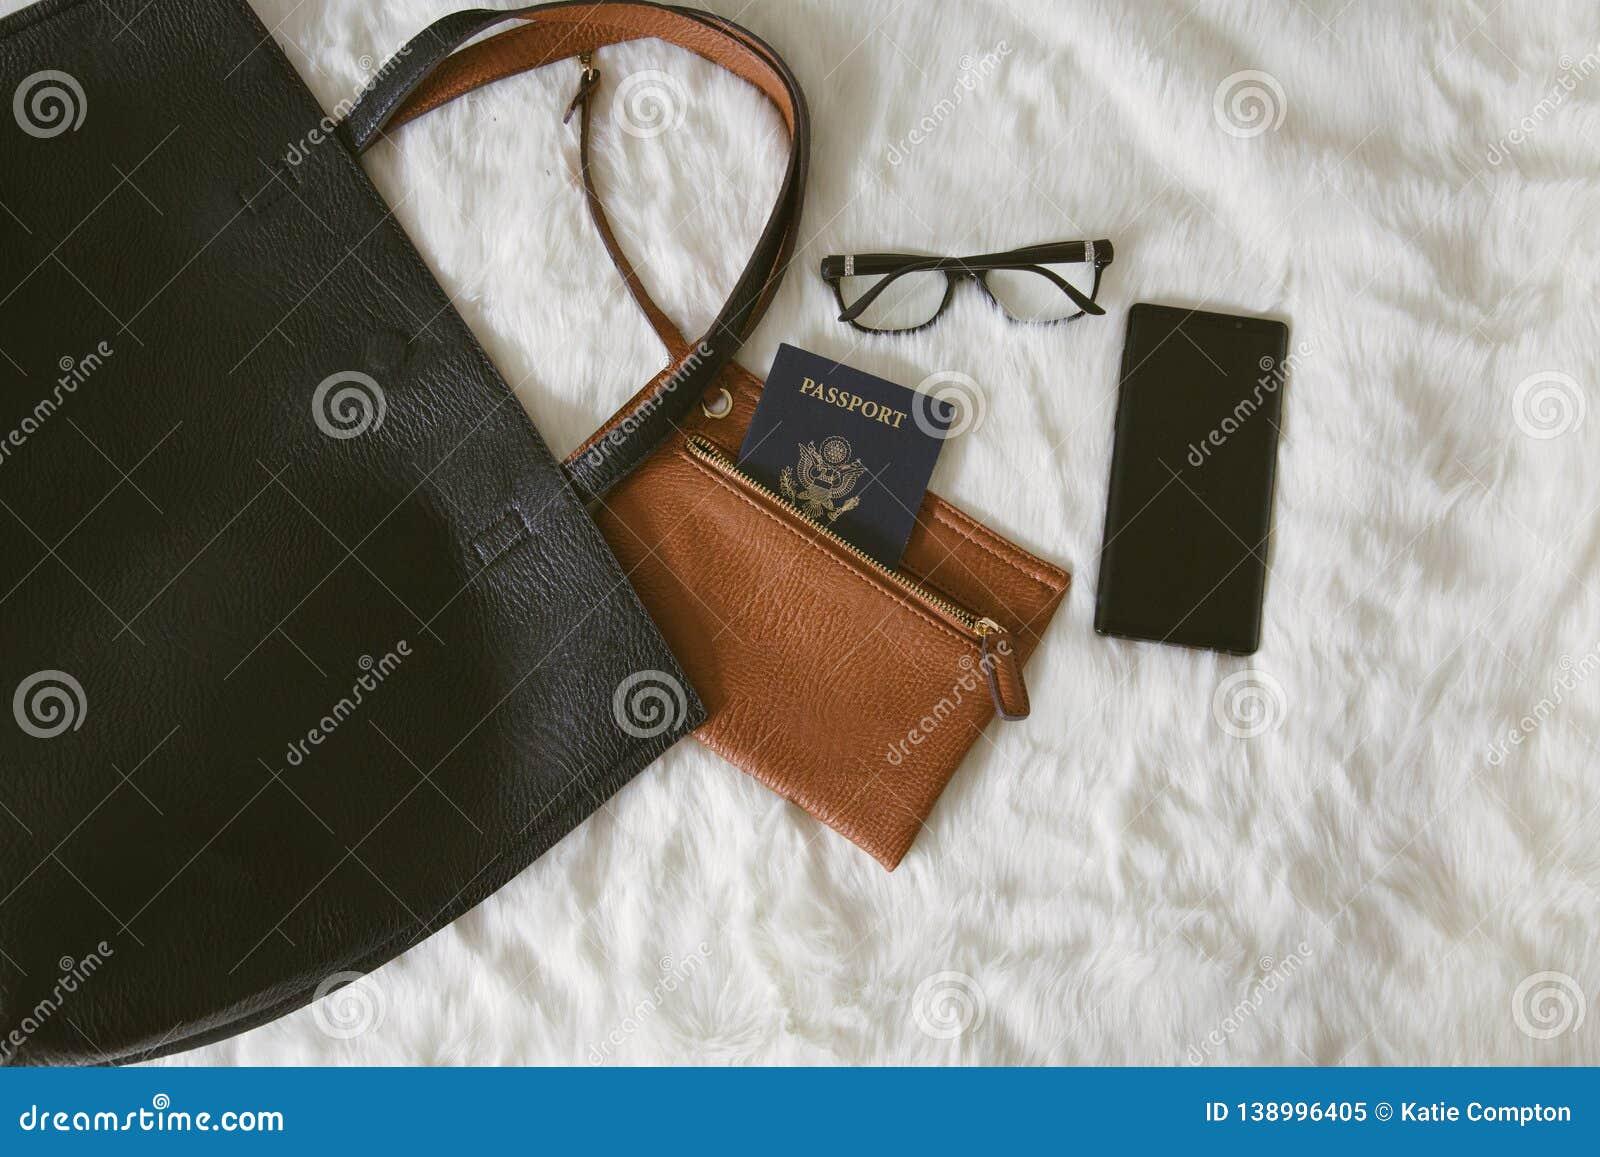 Packing Travel Essentials